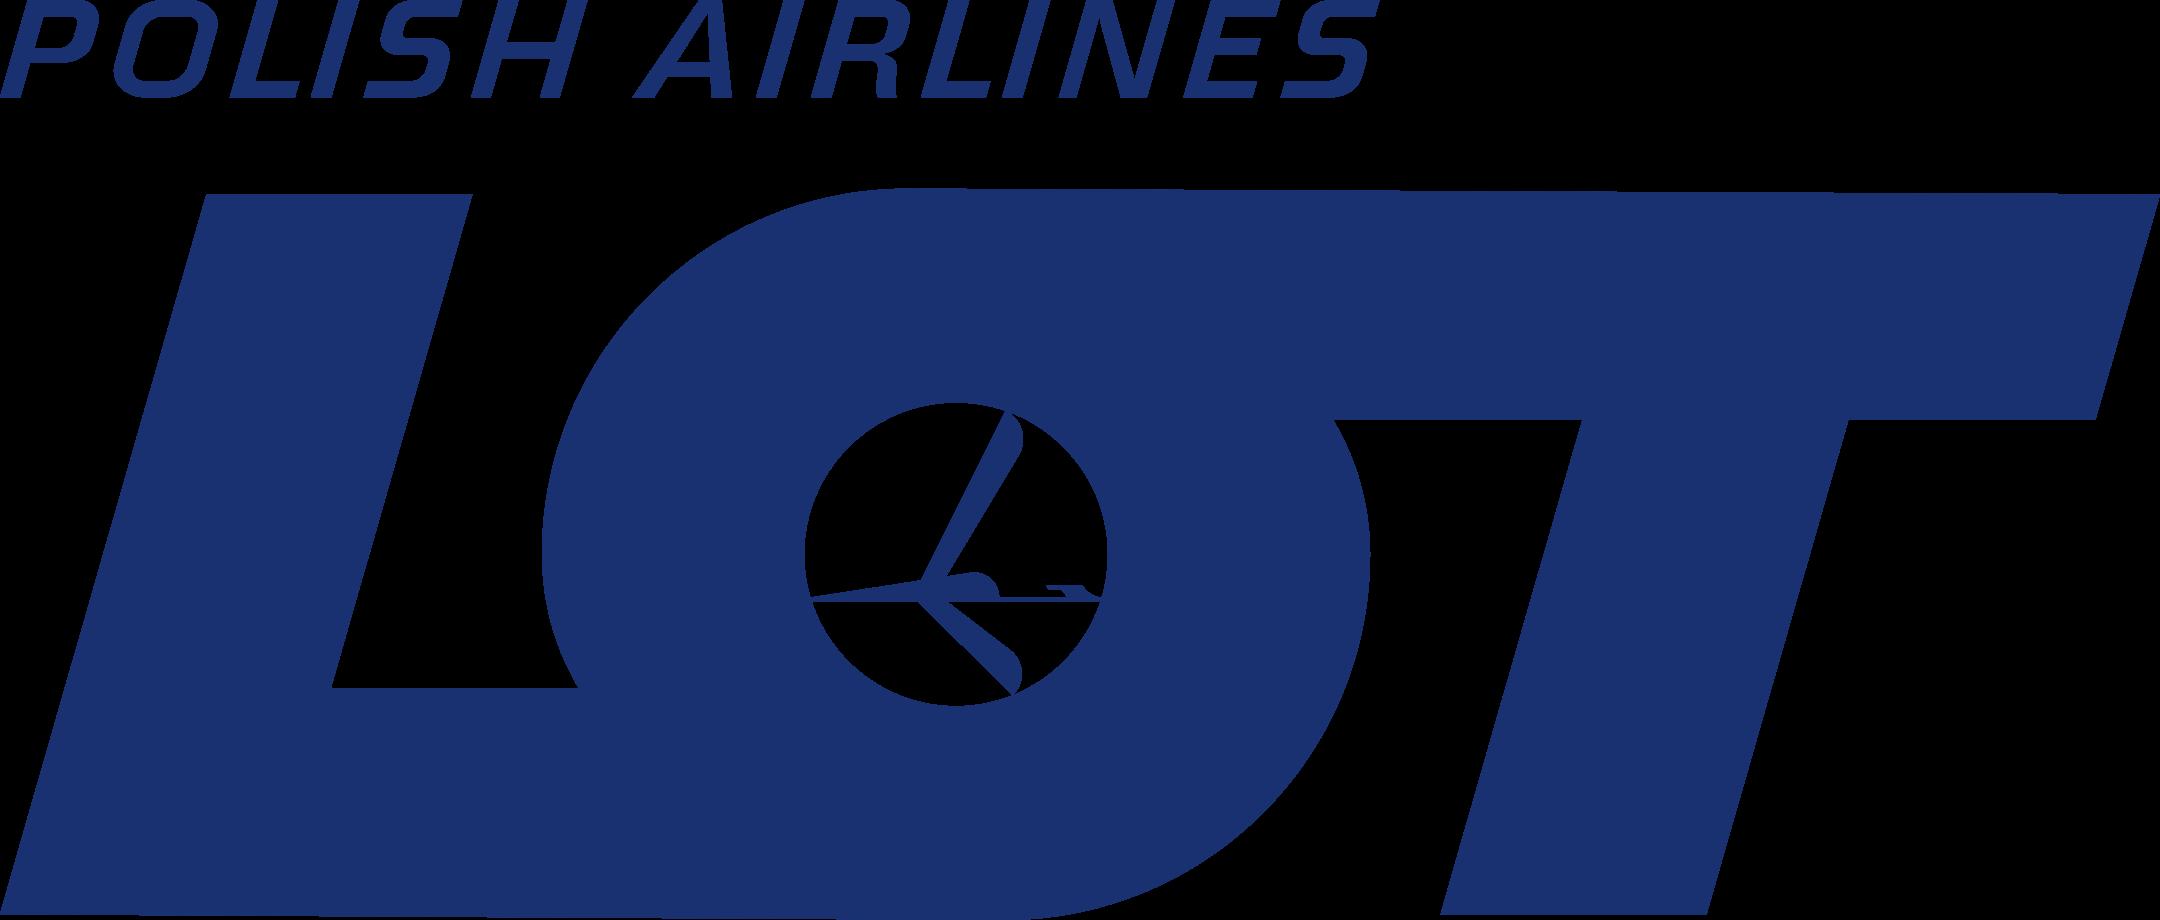 lot polish airlines logo 1 - LOT Polish Airlines Logo